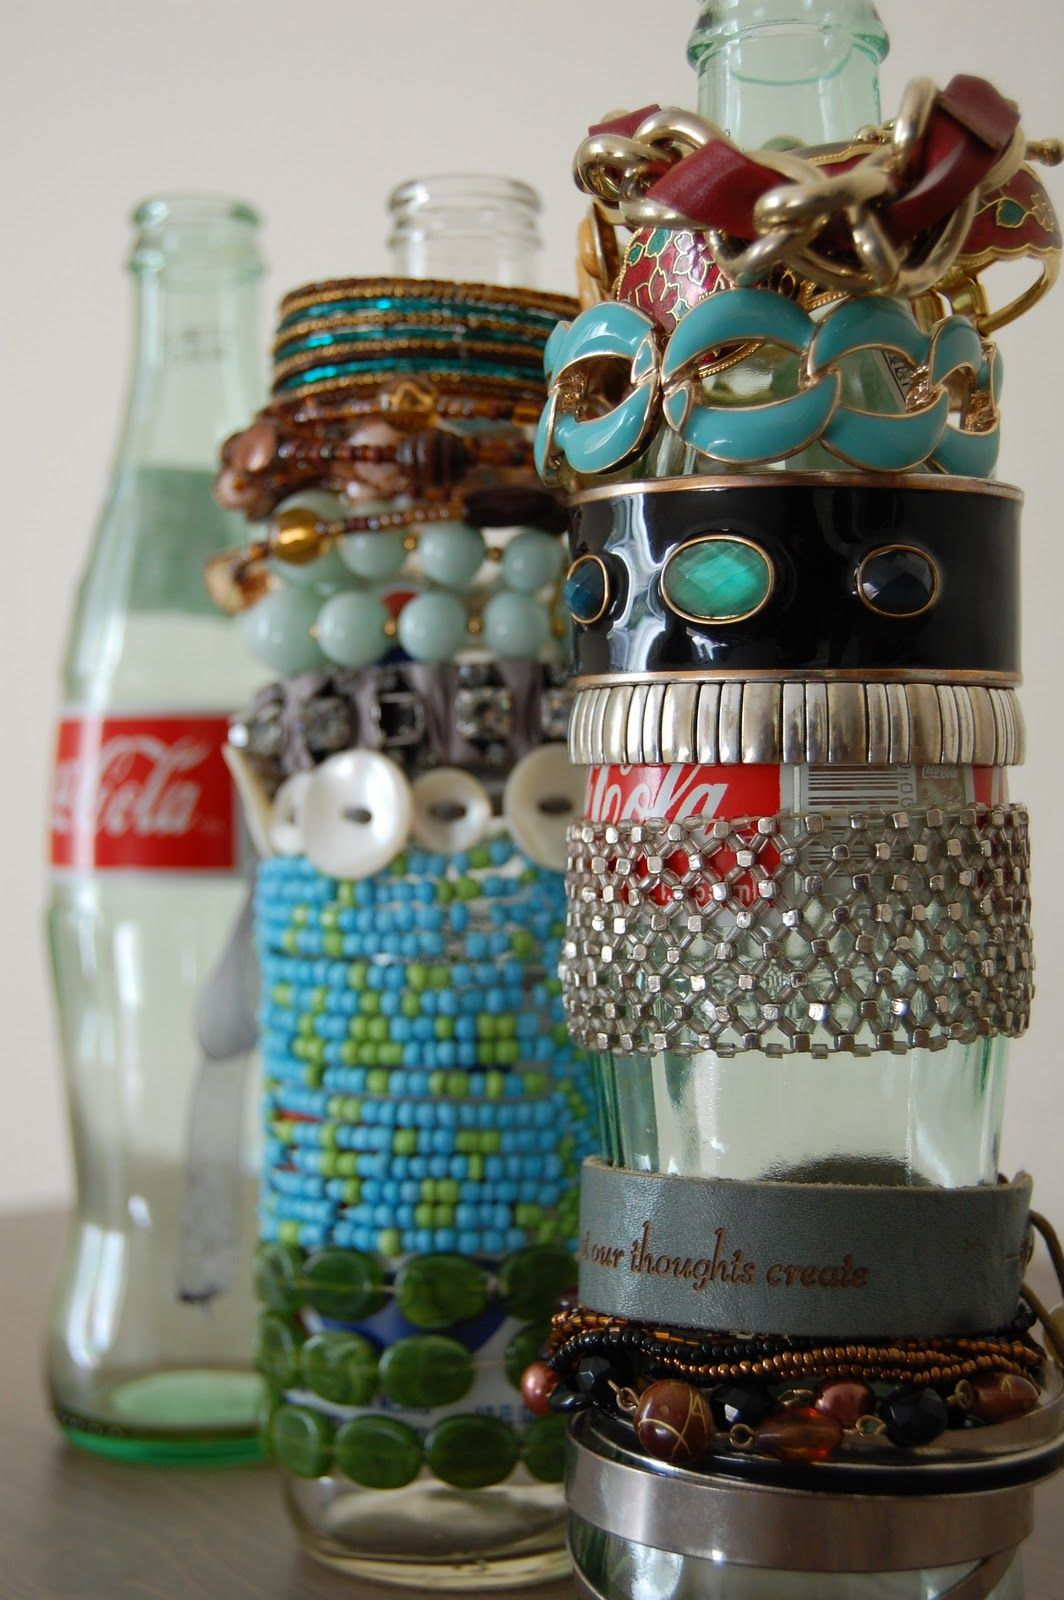 creative use for old drink bottles